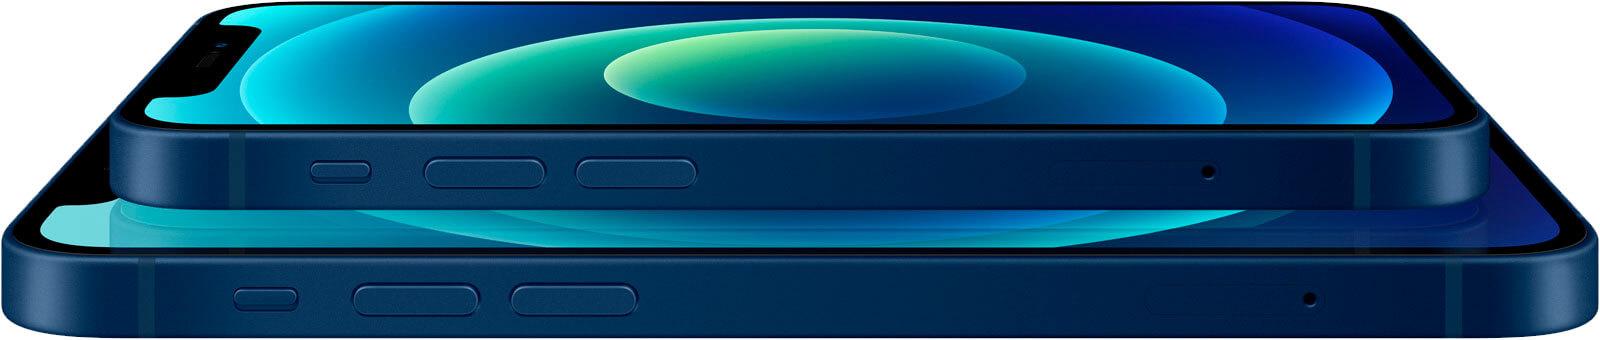 Nuevo iPhone 12 Azul Barato